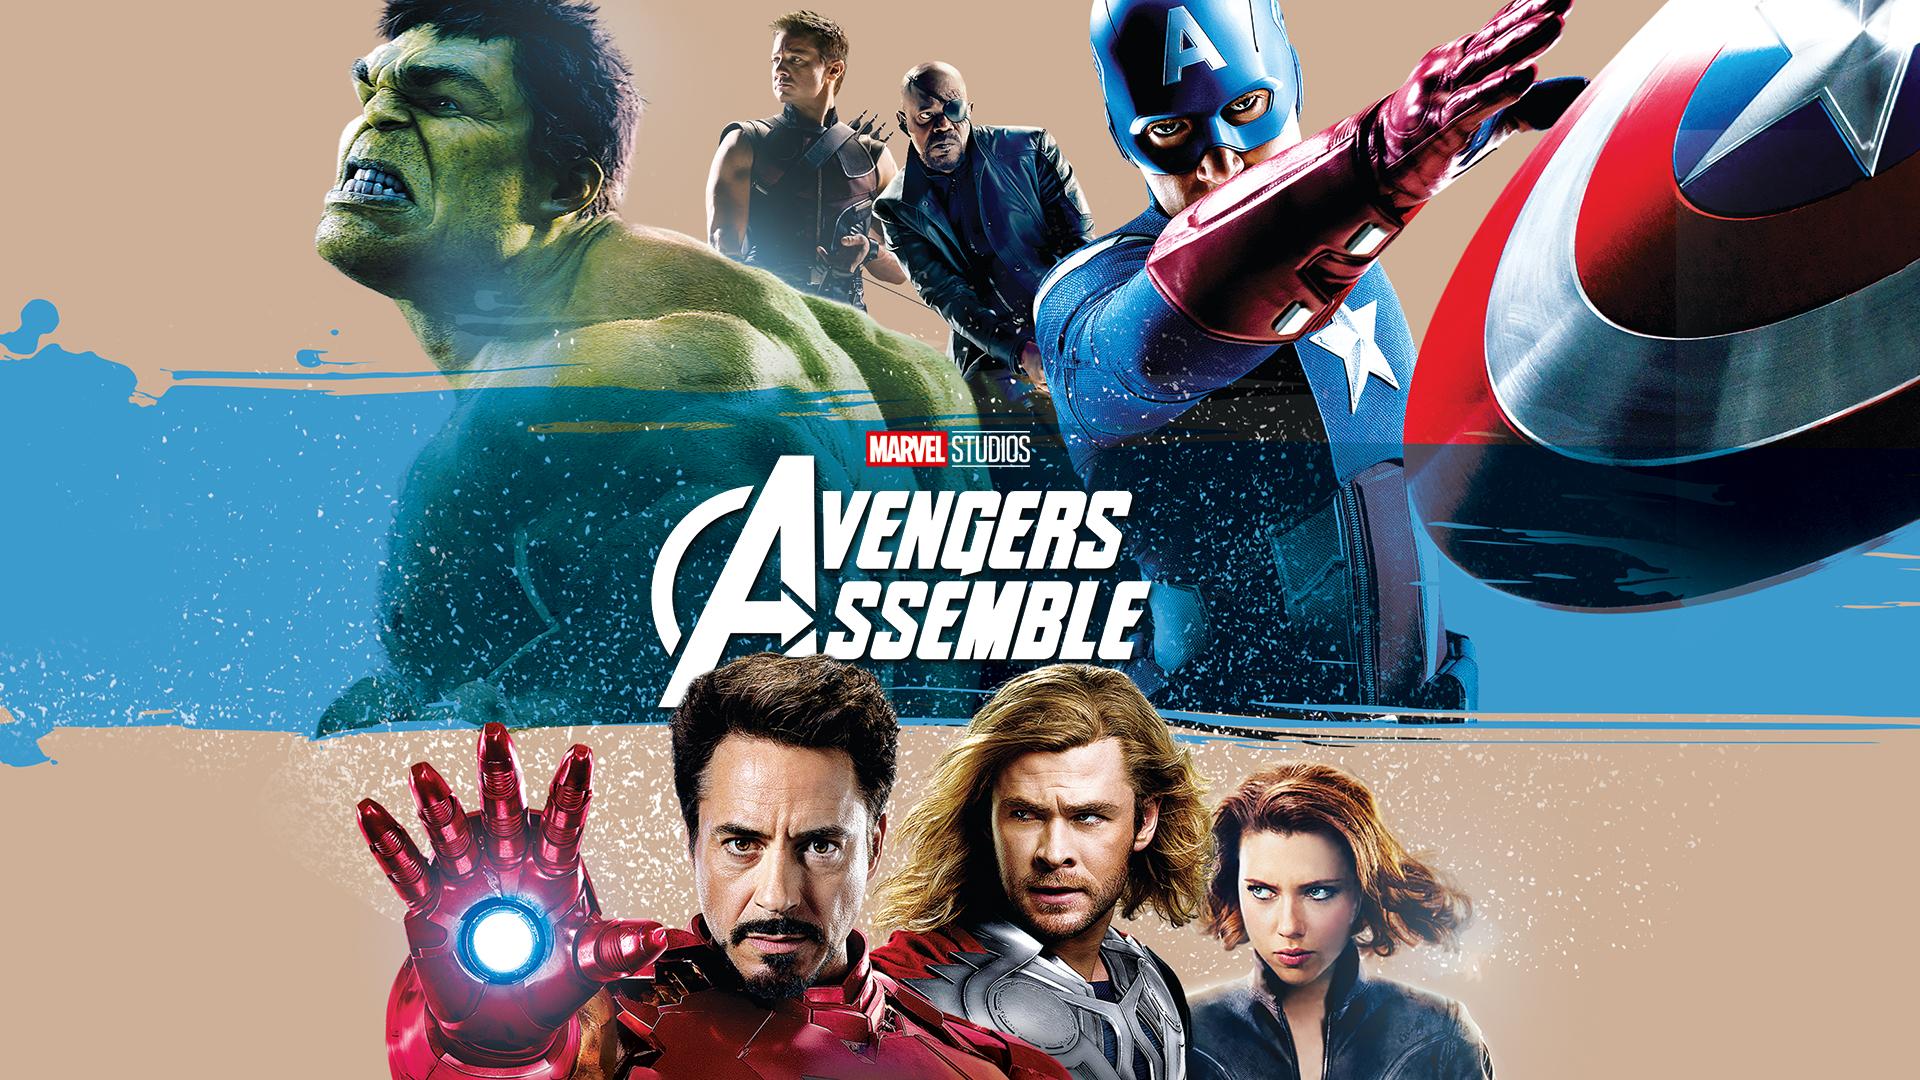 Avengers Iron Man Captain America Thor Black Widow Hawkeye Hulk Nick Fury 1920x1080